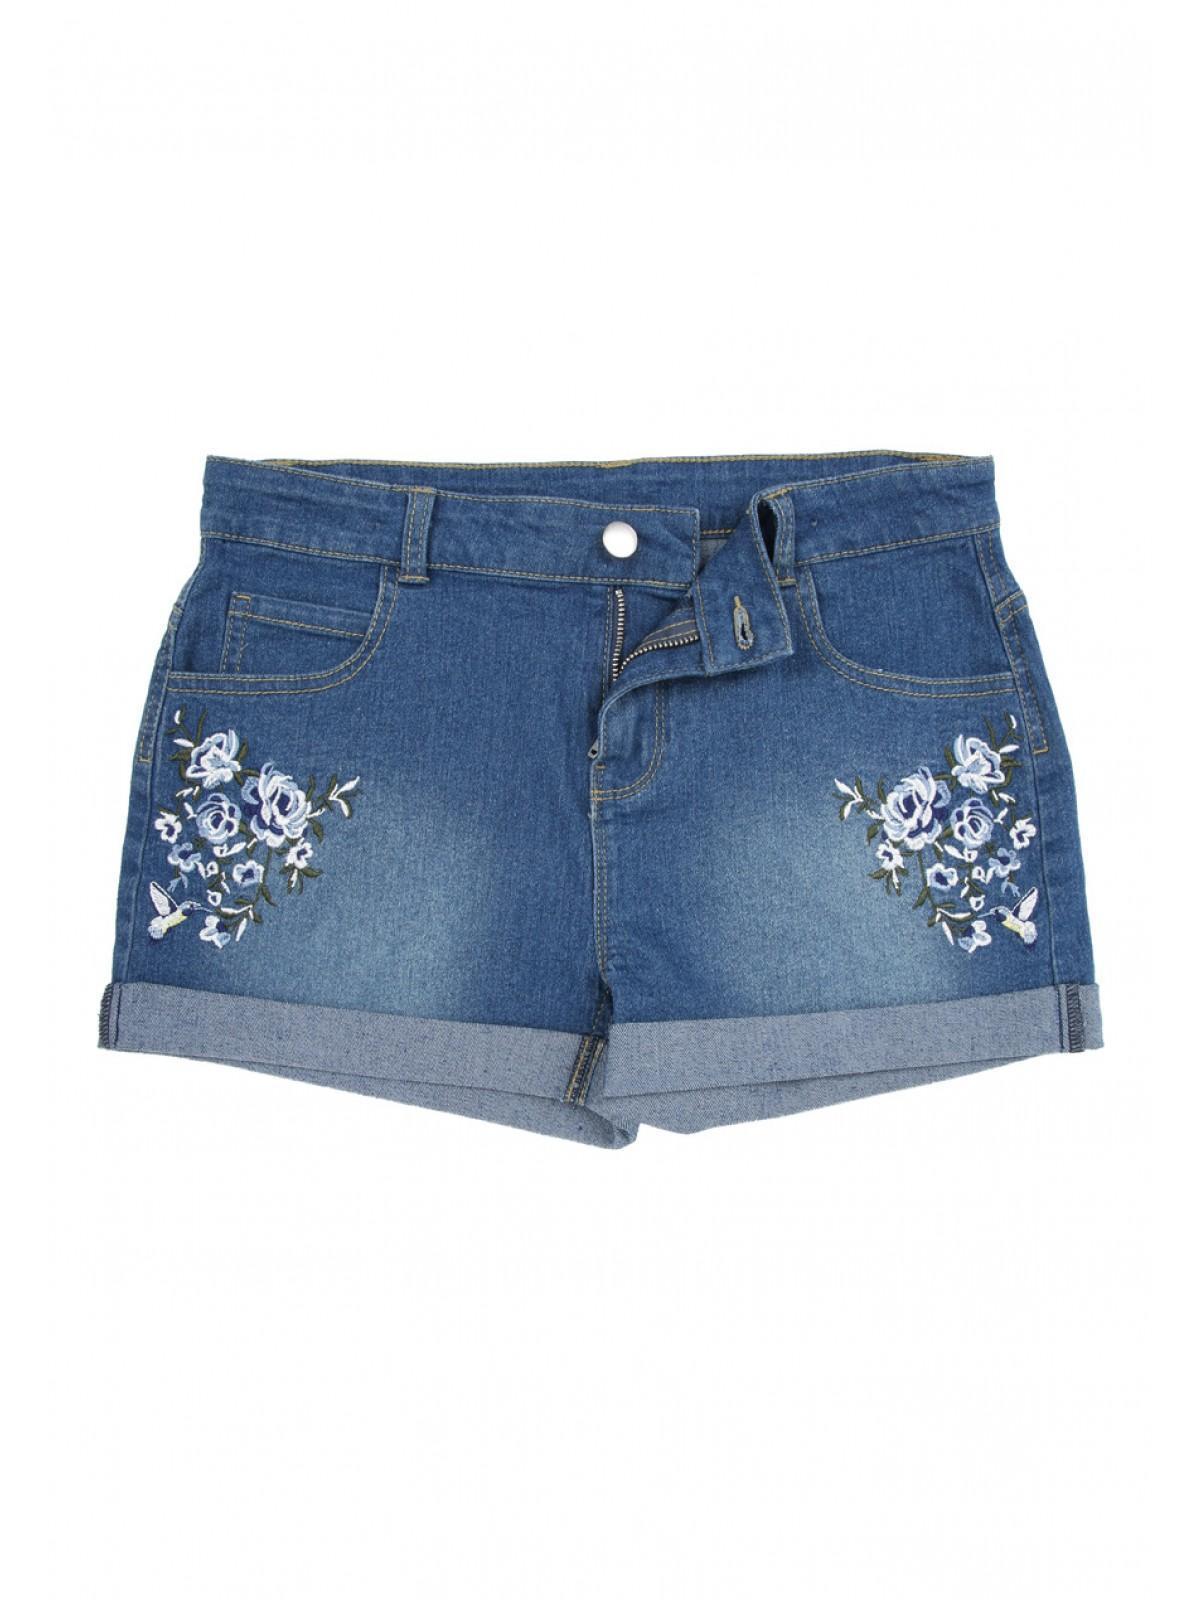 7be782c43b Girls Older Girls Blue Floral Embroidered Denim Shorts | Peacocks